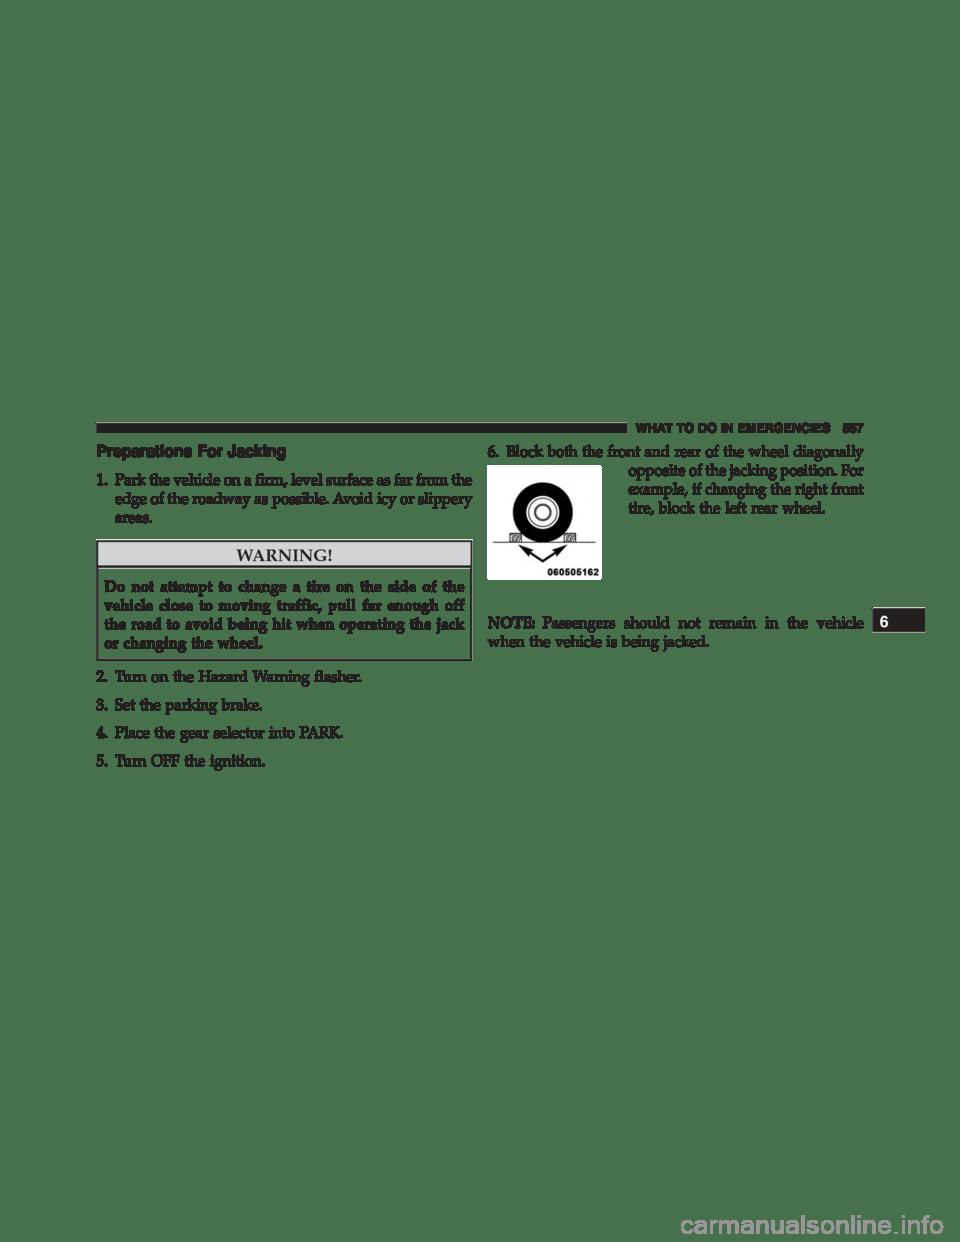 DODGE DURANGO 2015 3.G Owners Manual